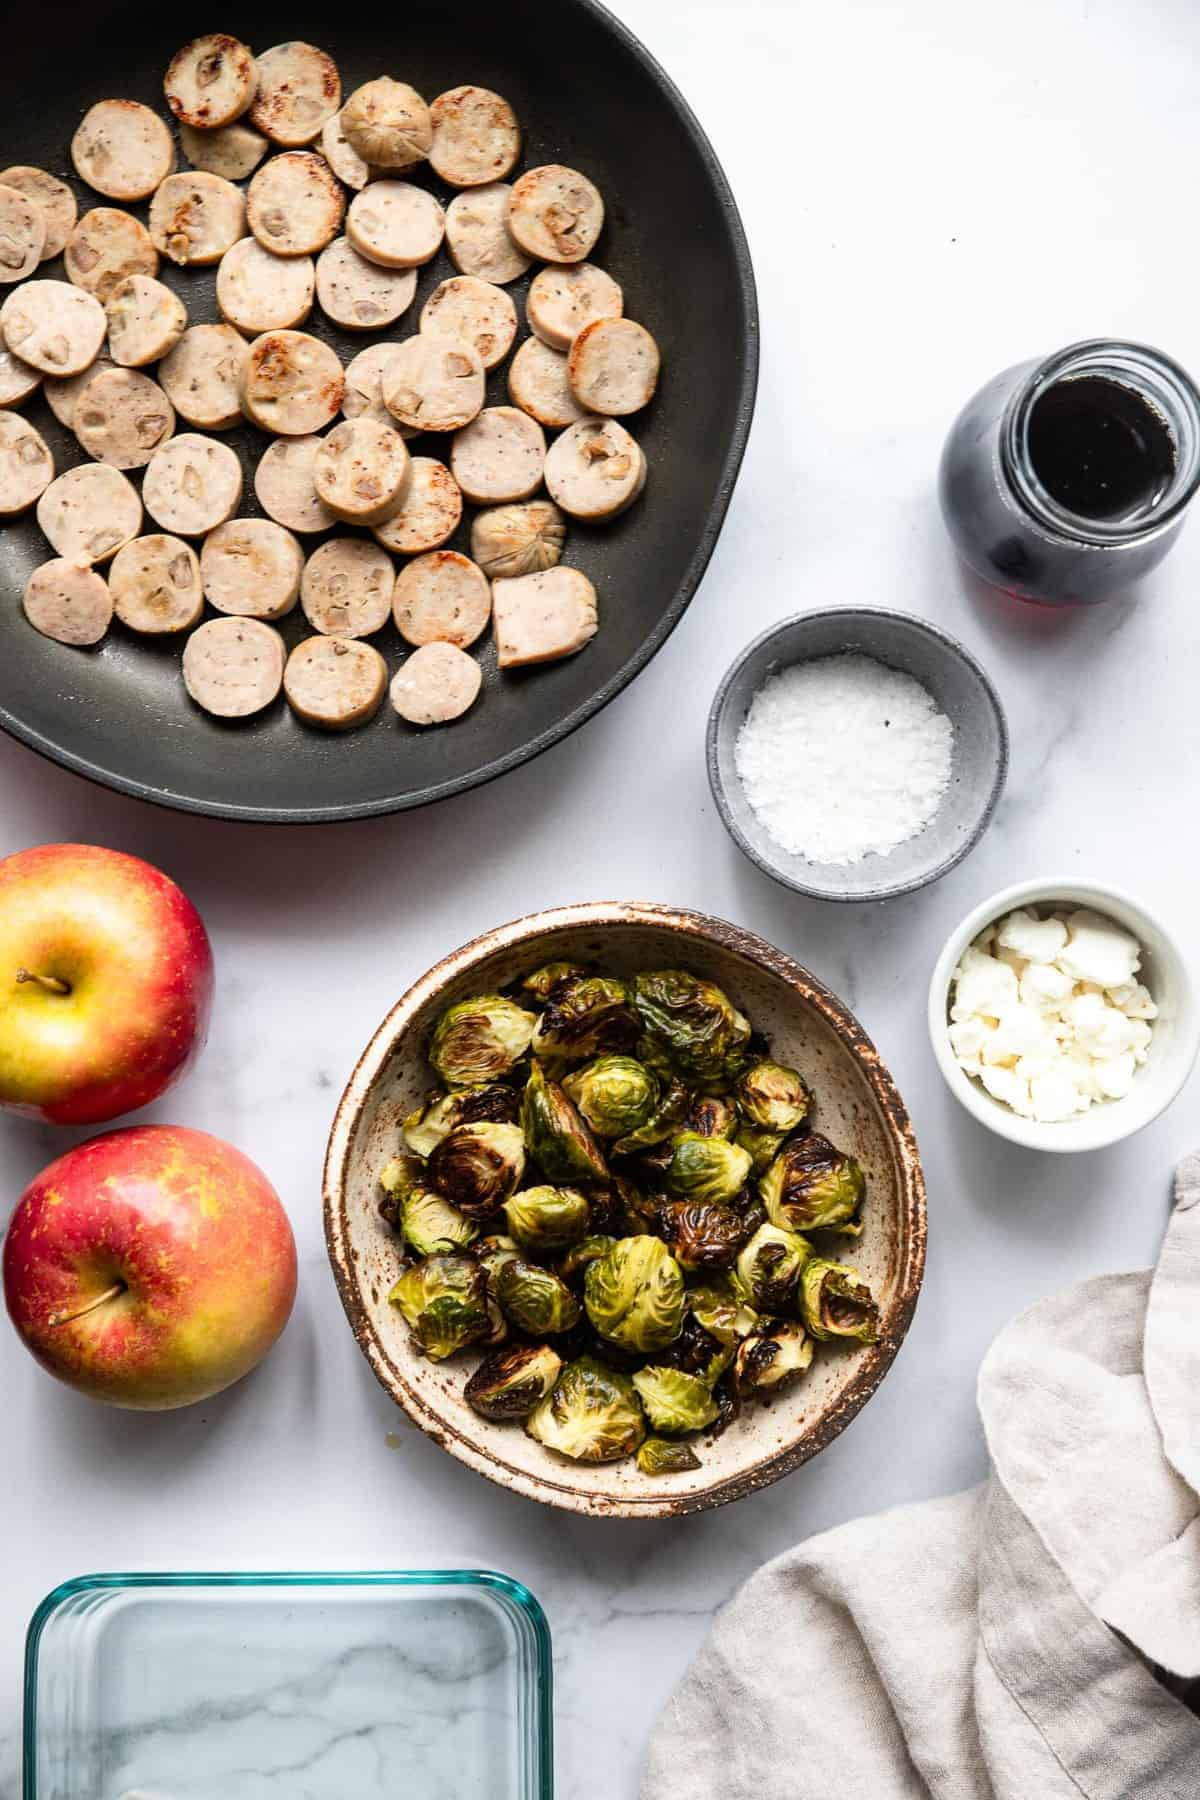 Ingredients to make meal prep bowls